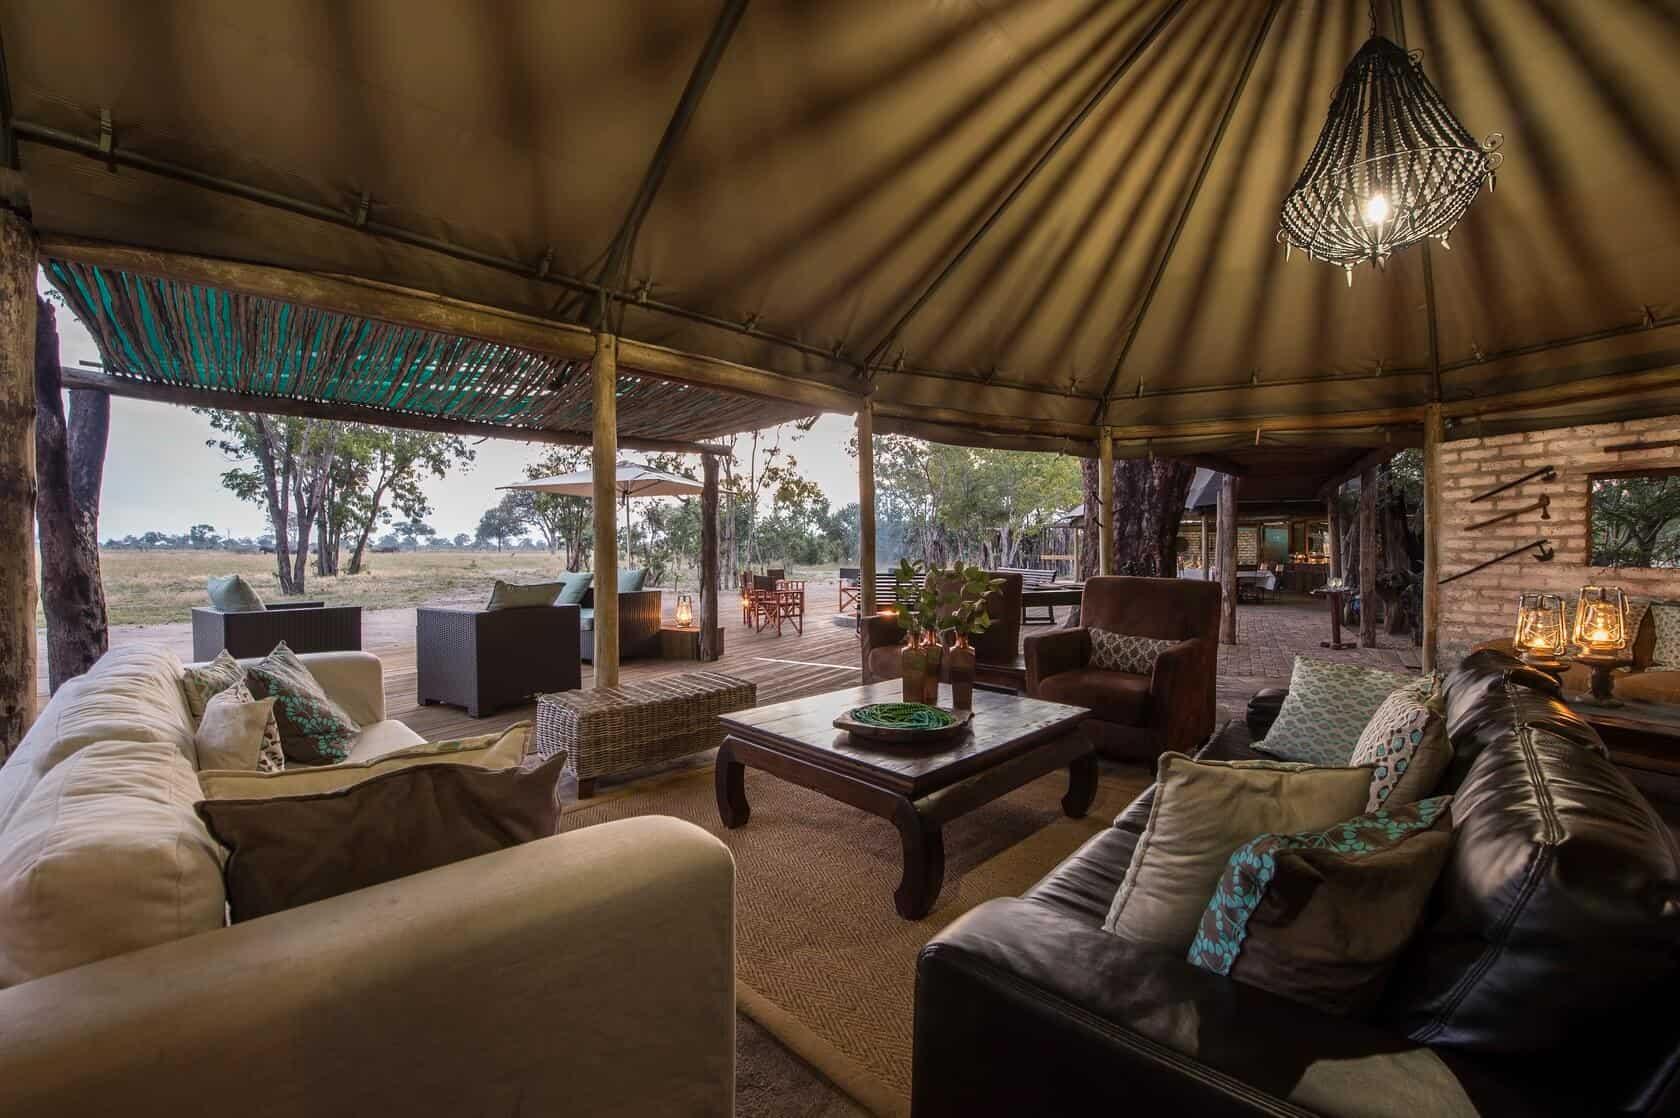 Tailormade-safaris-little-makalolo-hwange-zimbabwe